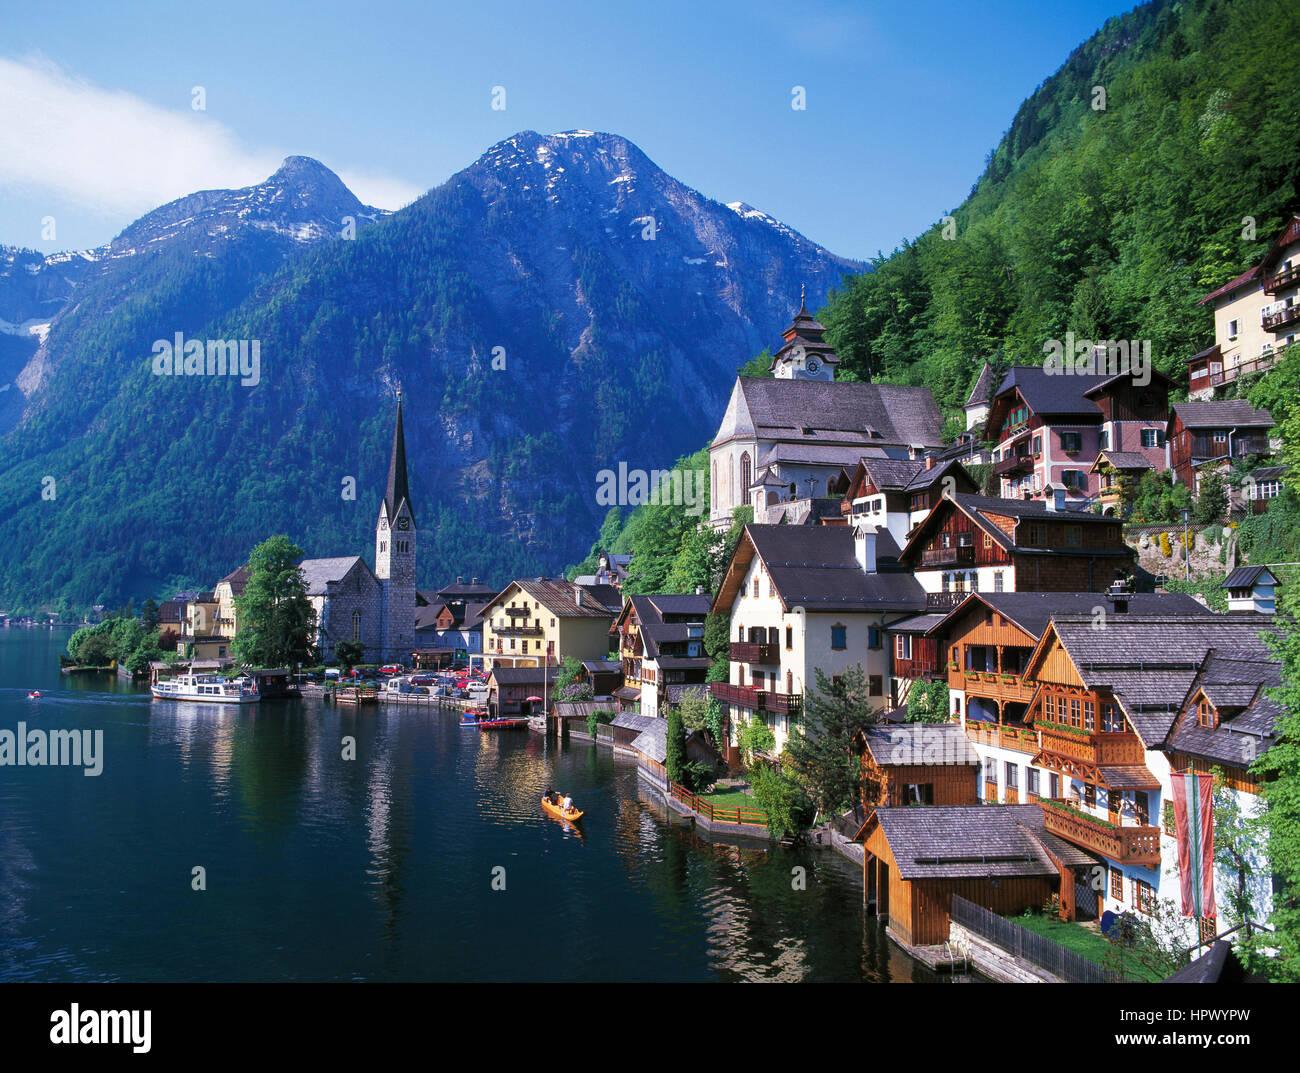 Hallstatt and Hallstattersee, Saltzkammergut, Tyrol, Austria - Stock Image